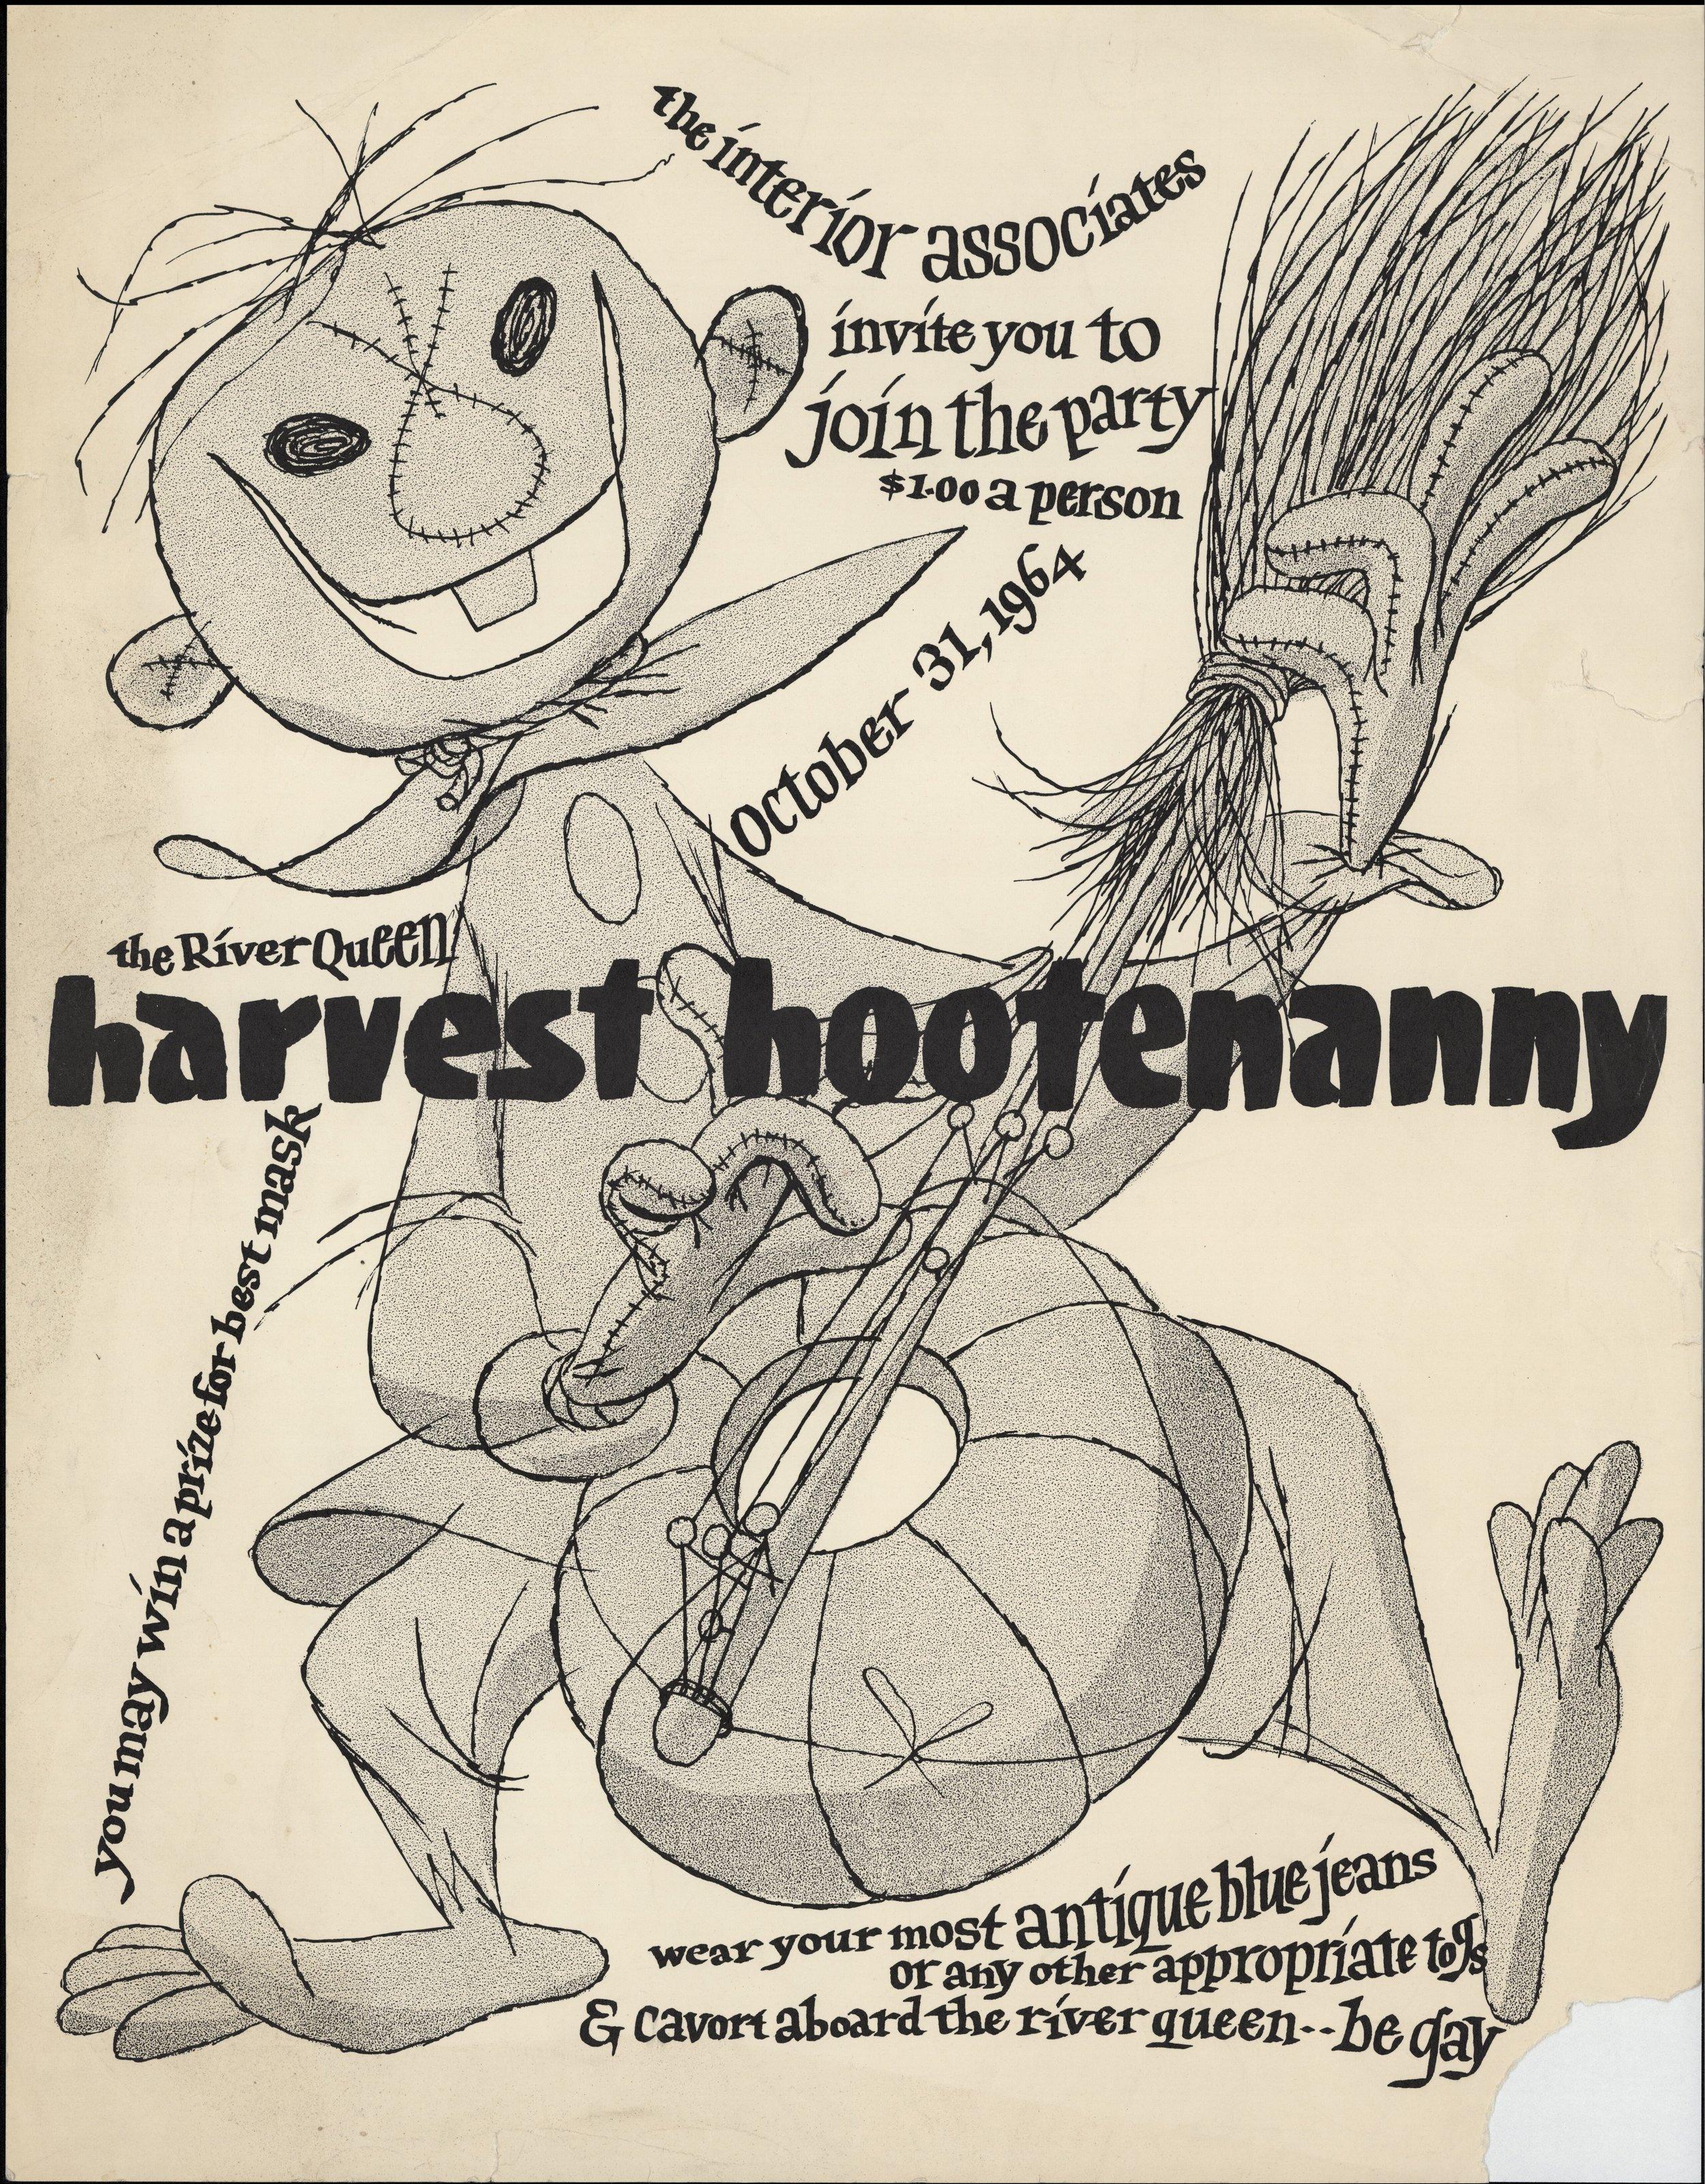 Associates Harvest hootenanny_Hoff_poster_1964_Folder 3_patched.jpg